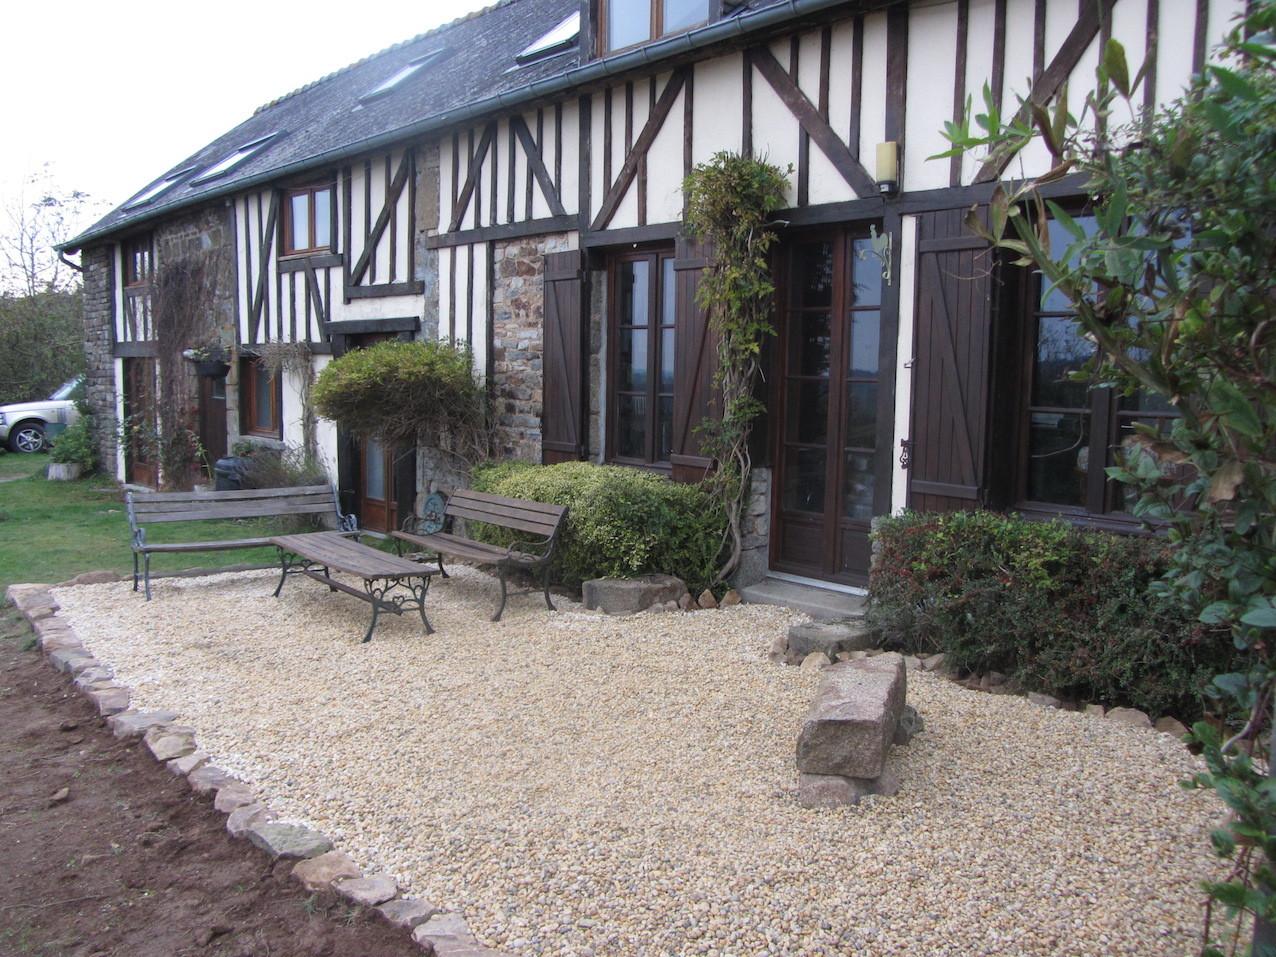 gite holidays at Le Choisel, Normandy, France